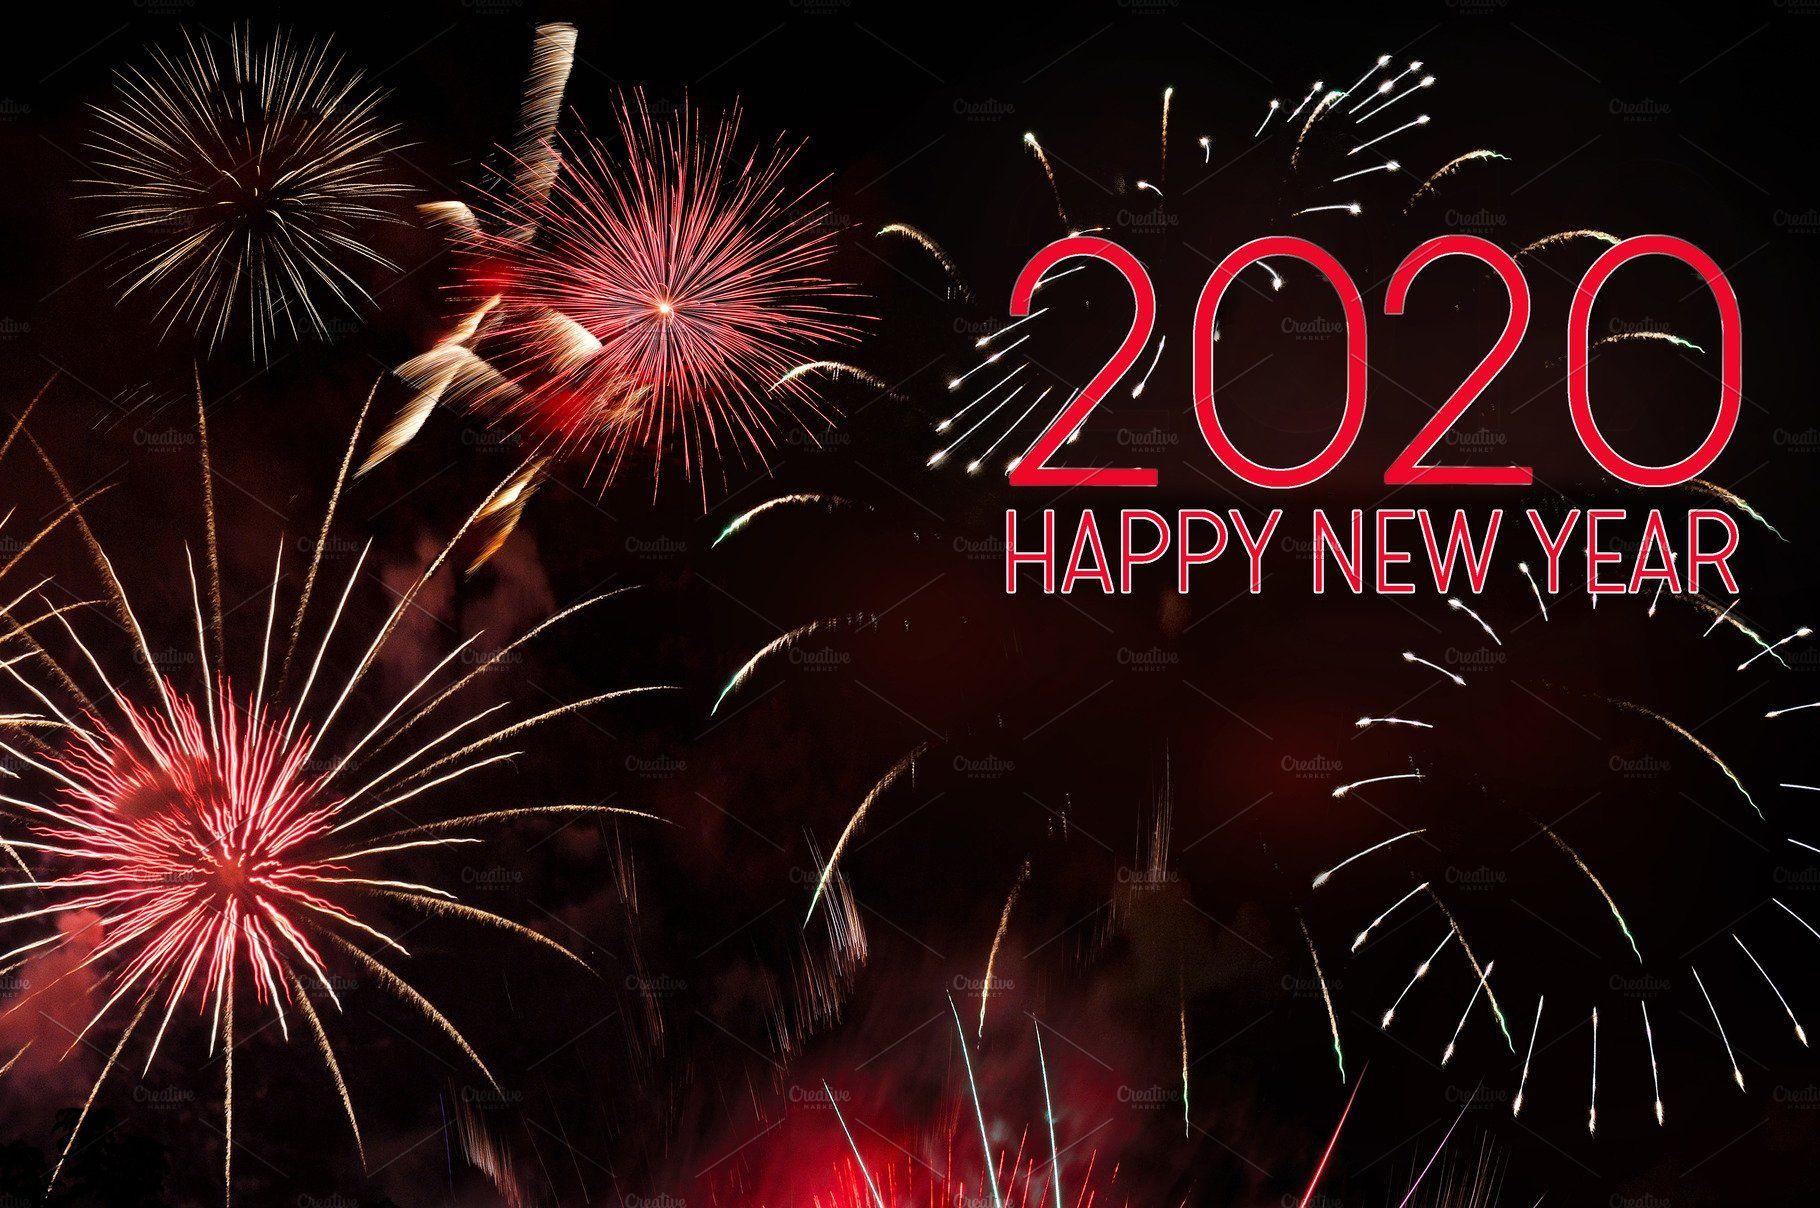 New year 2020 greeting card (มีรูปภาพ)